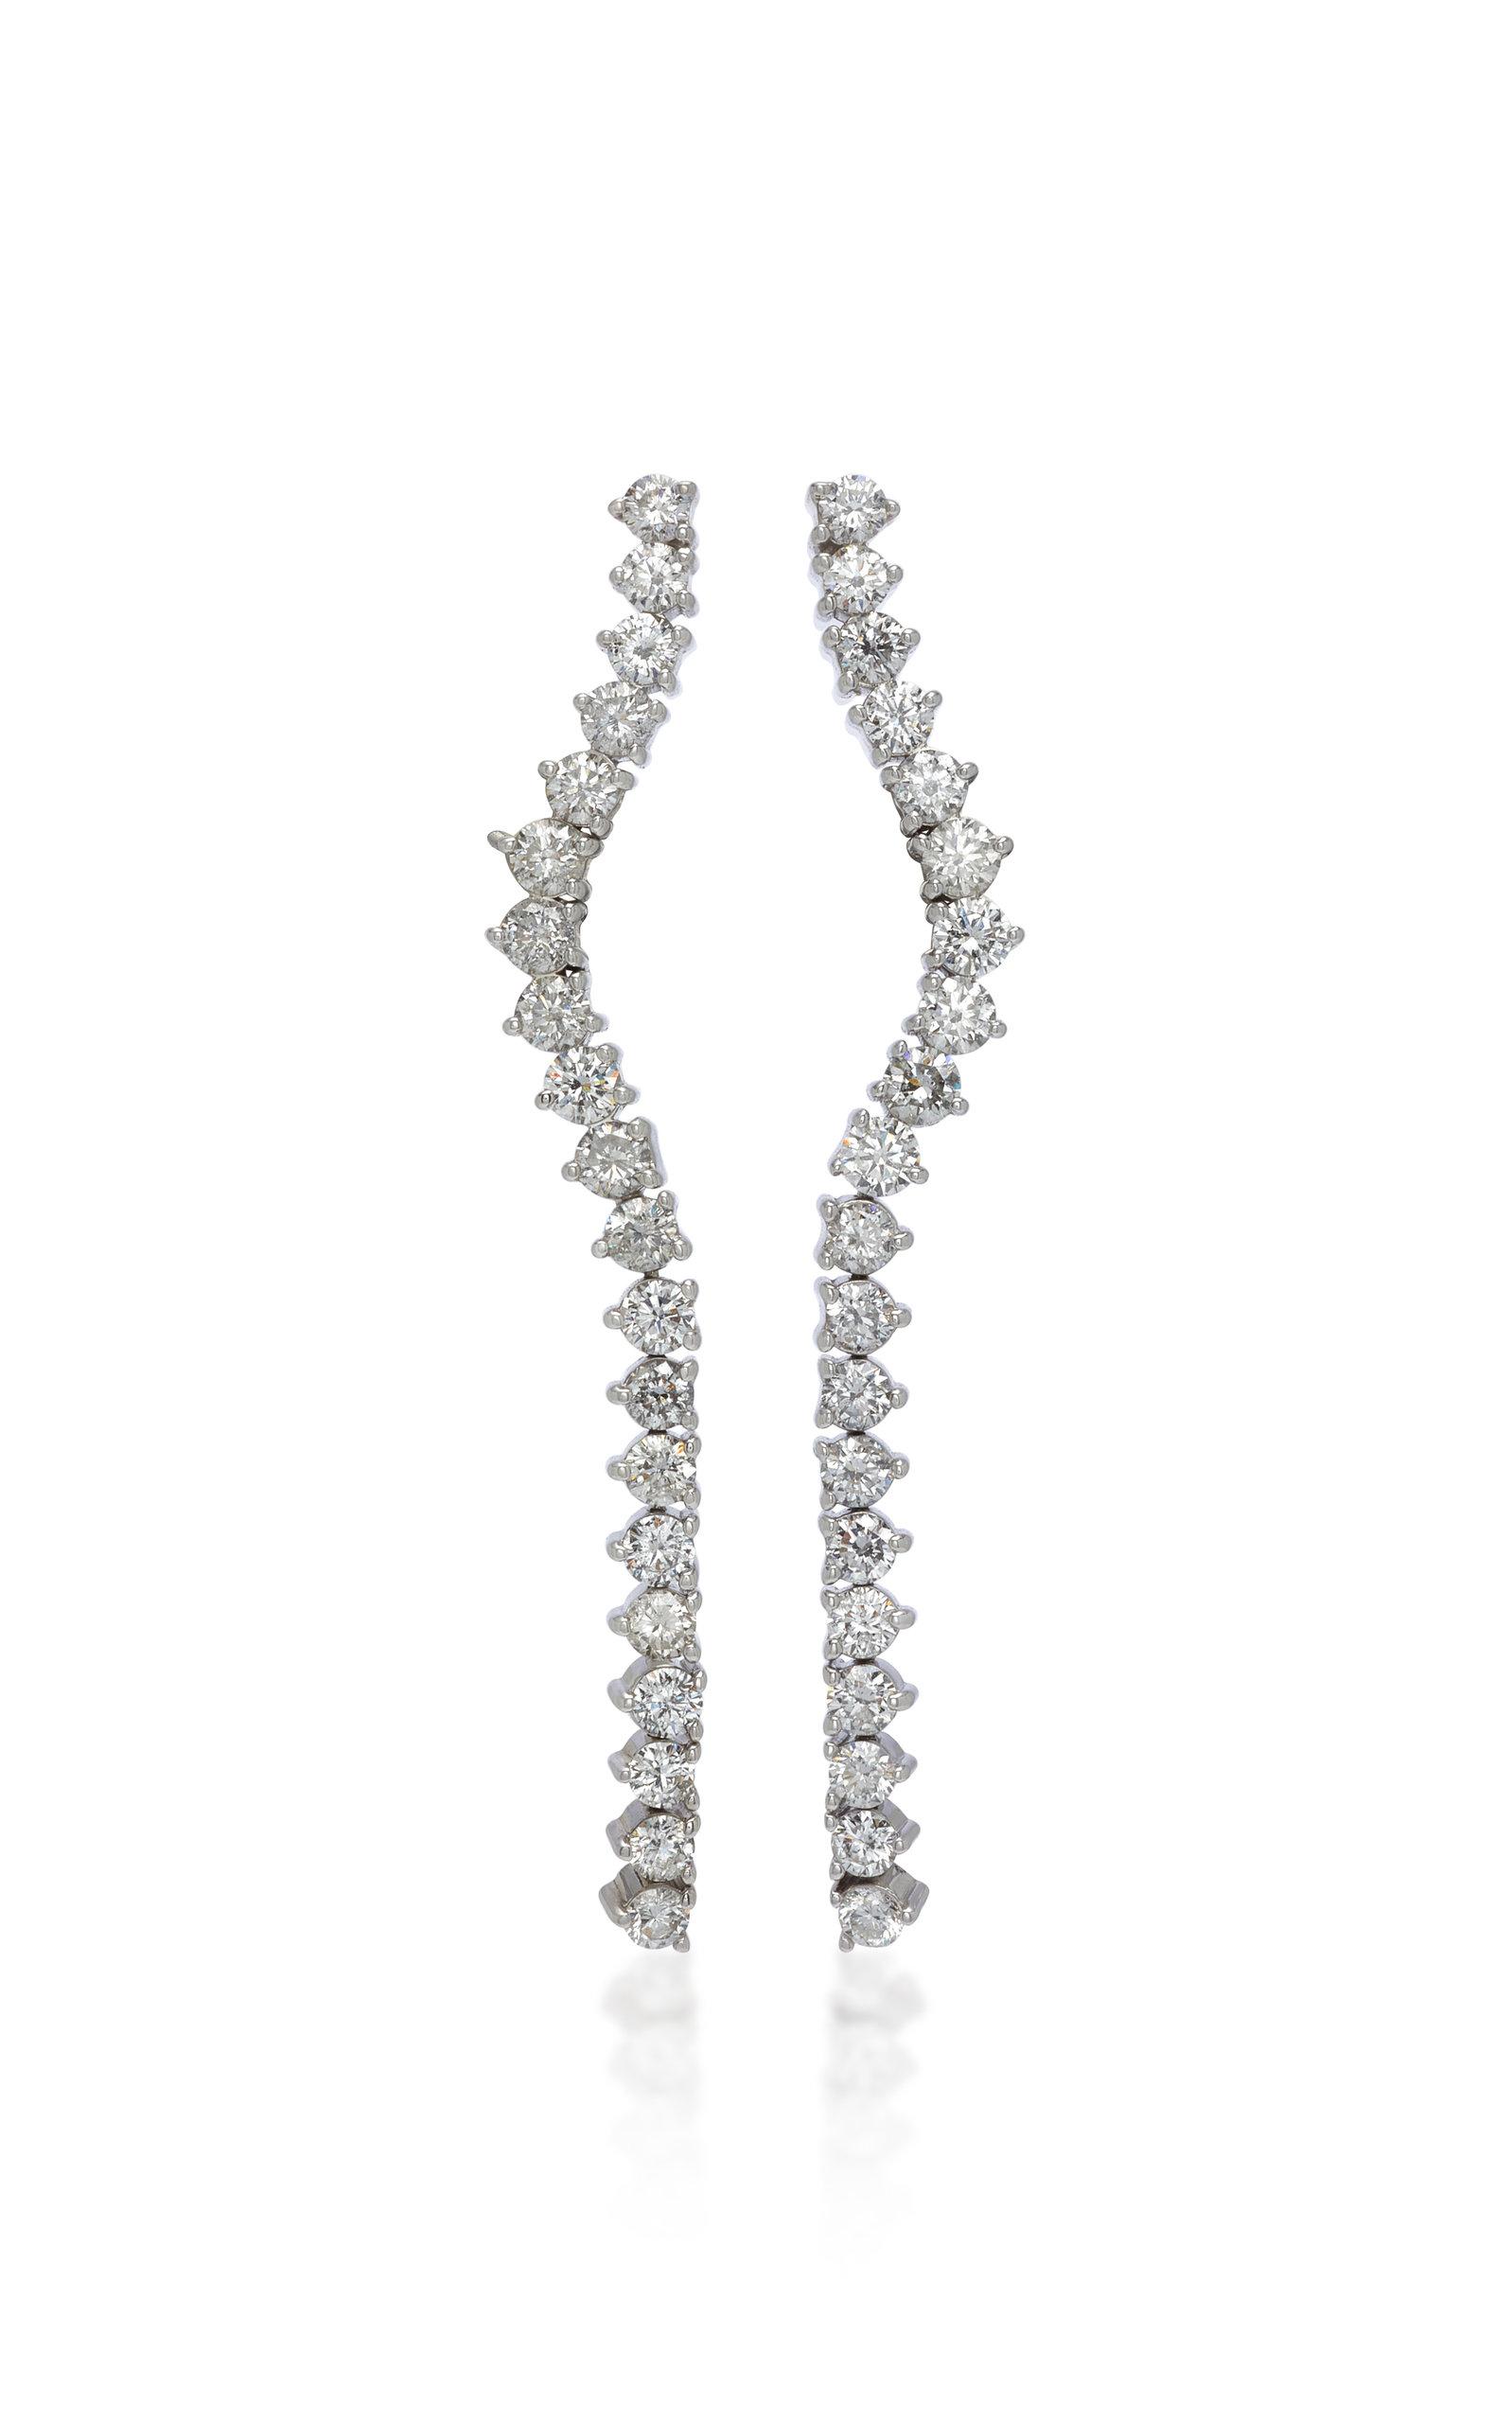 LYNN BAN JEWELRY Rivulet Sterling Silver And Diamond Earrings in White